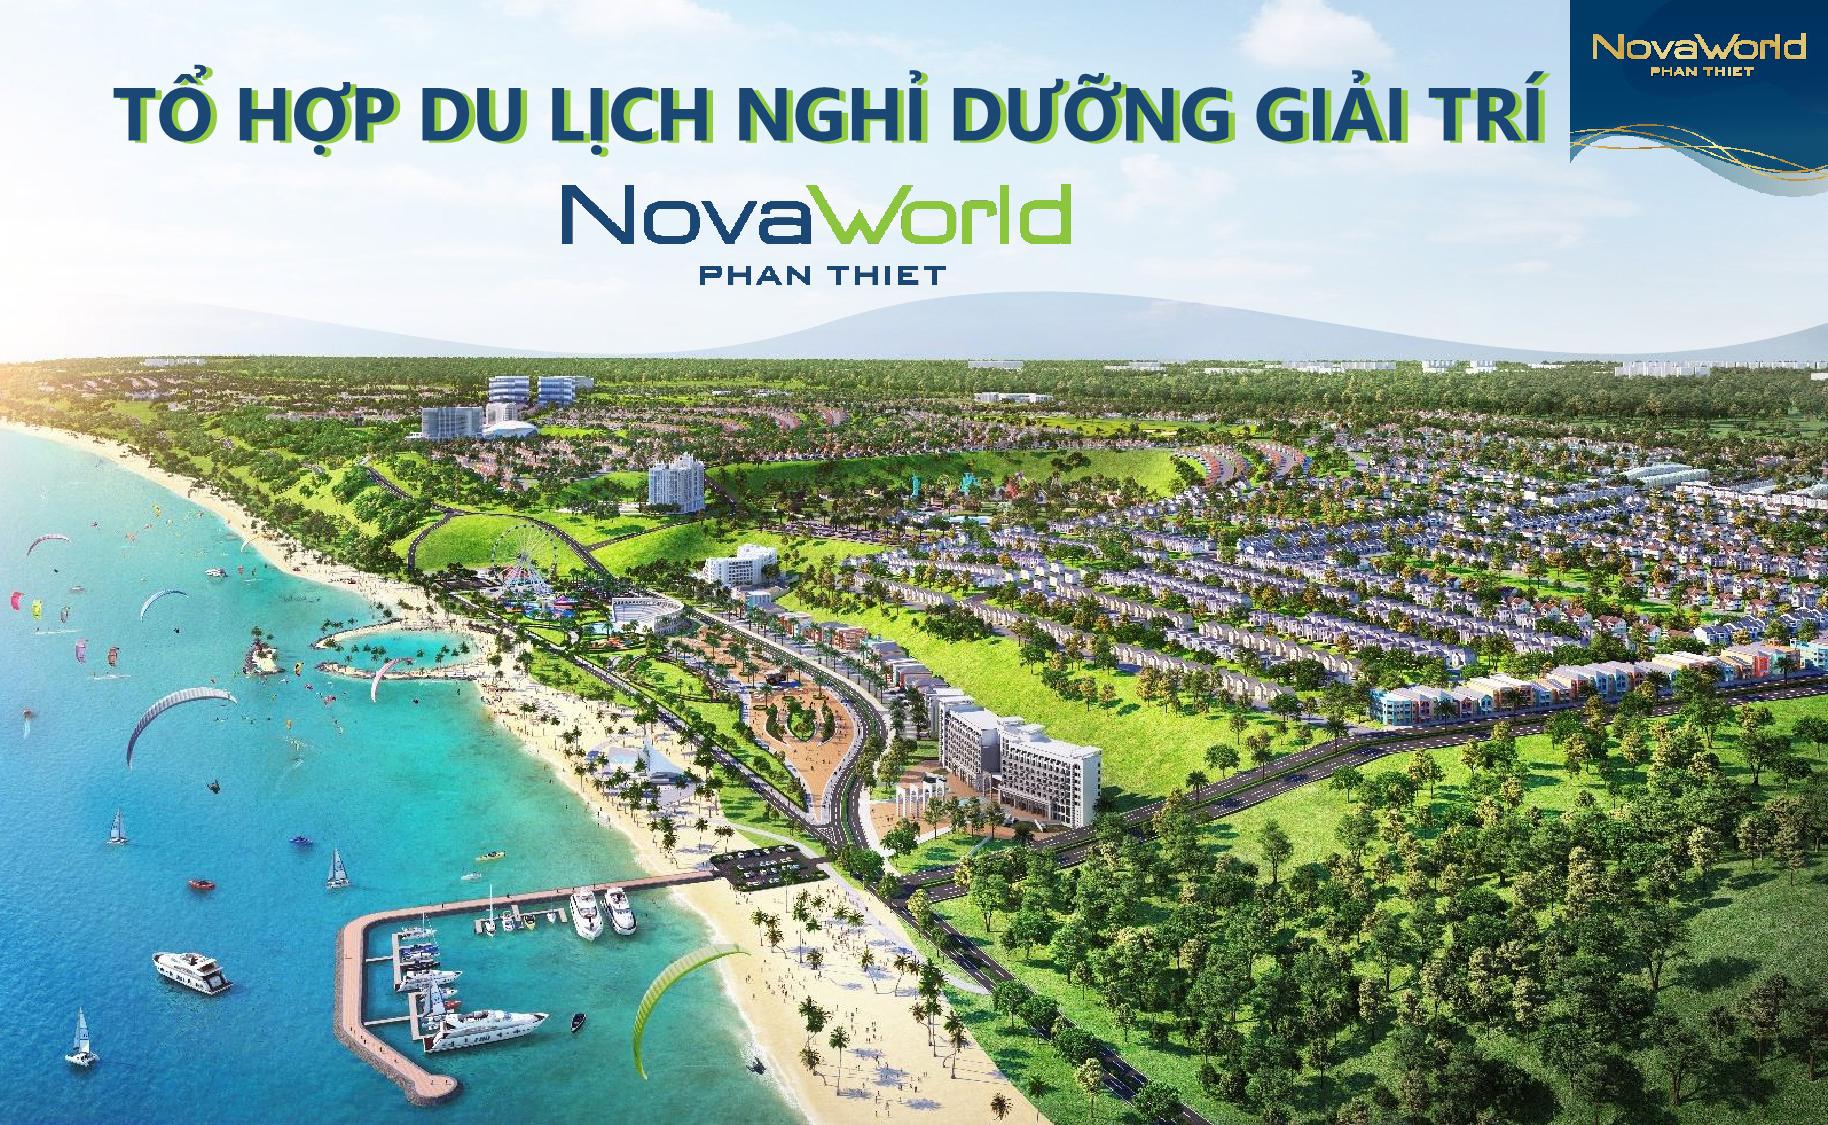 Novawolrd Phan Thiết